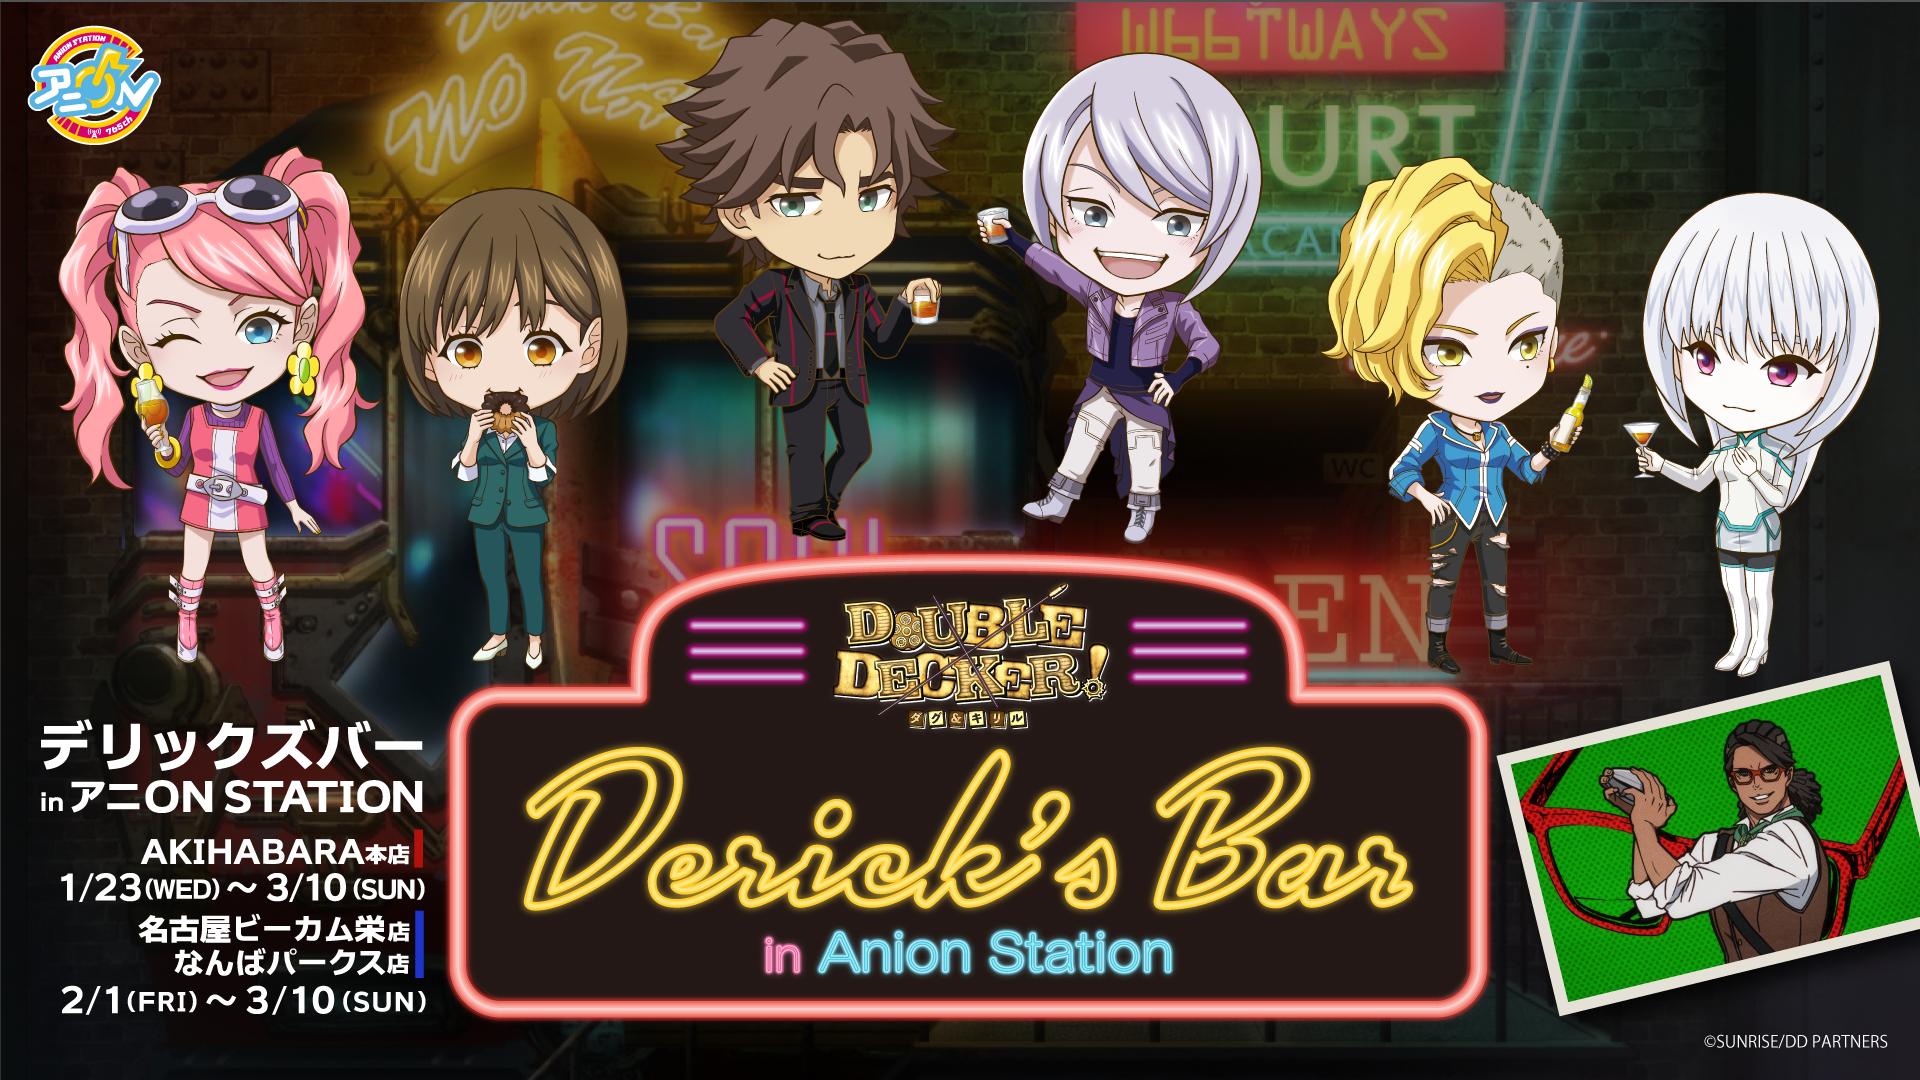 2/15【AKIHABARA本店】DOUBLE DECKER! ダグ&キリル 『Derick's Bar in アニON STATION』